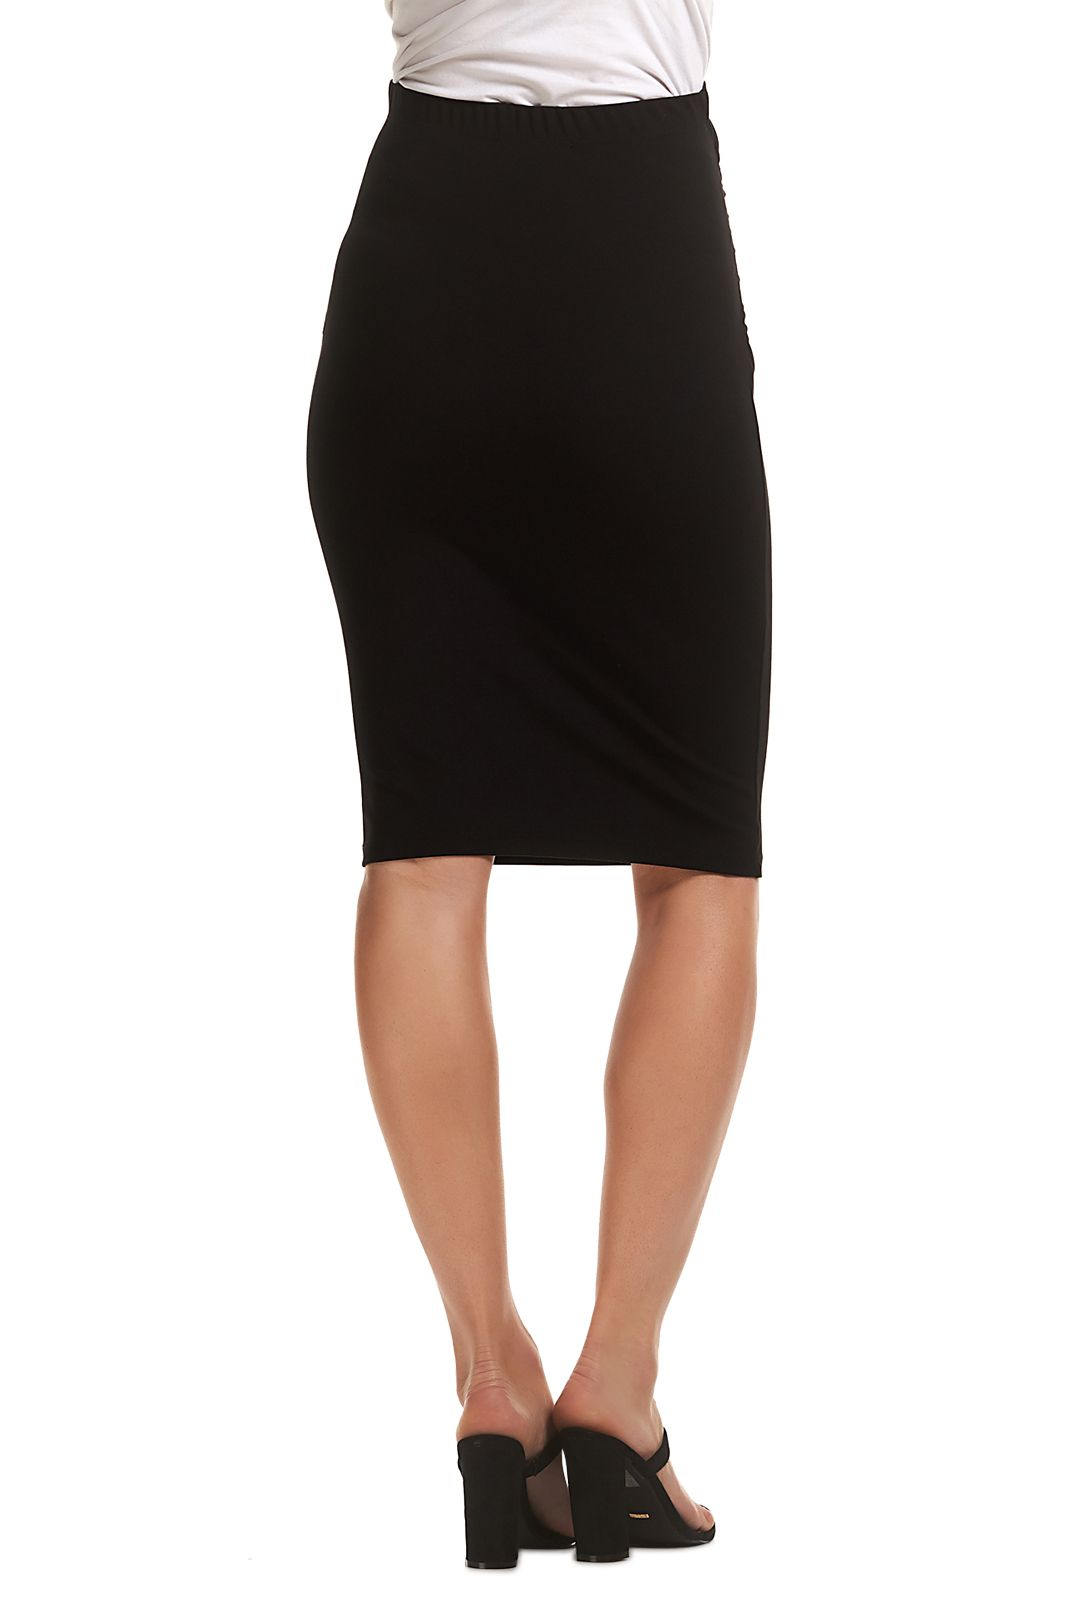 Soon-Maternity-Midi-Work-Skirt-Black-Back